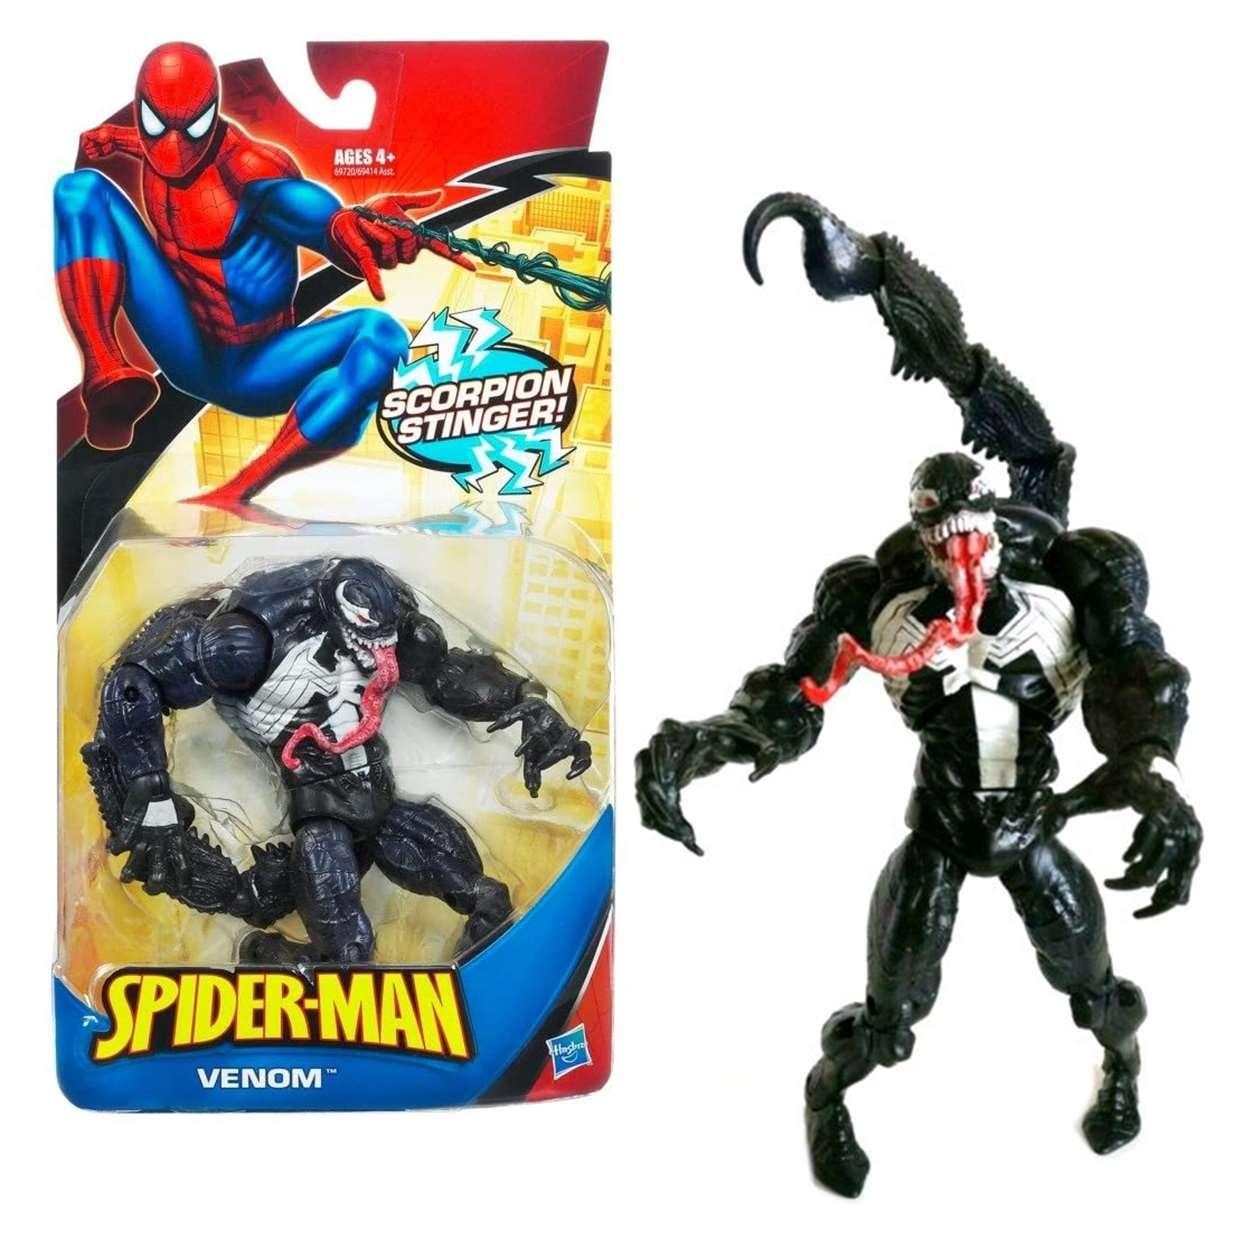 Venom Scorpion Stinger Figura Marvel Spider Man 4 Pulgadas